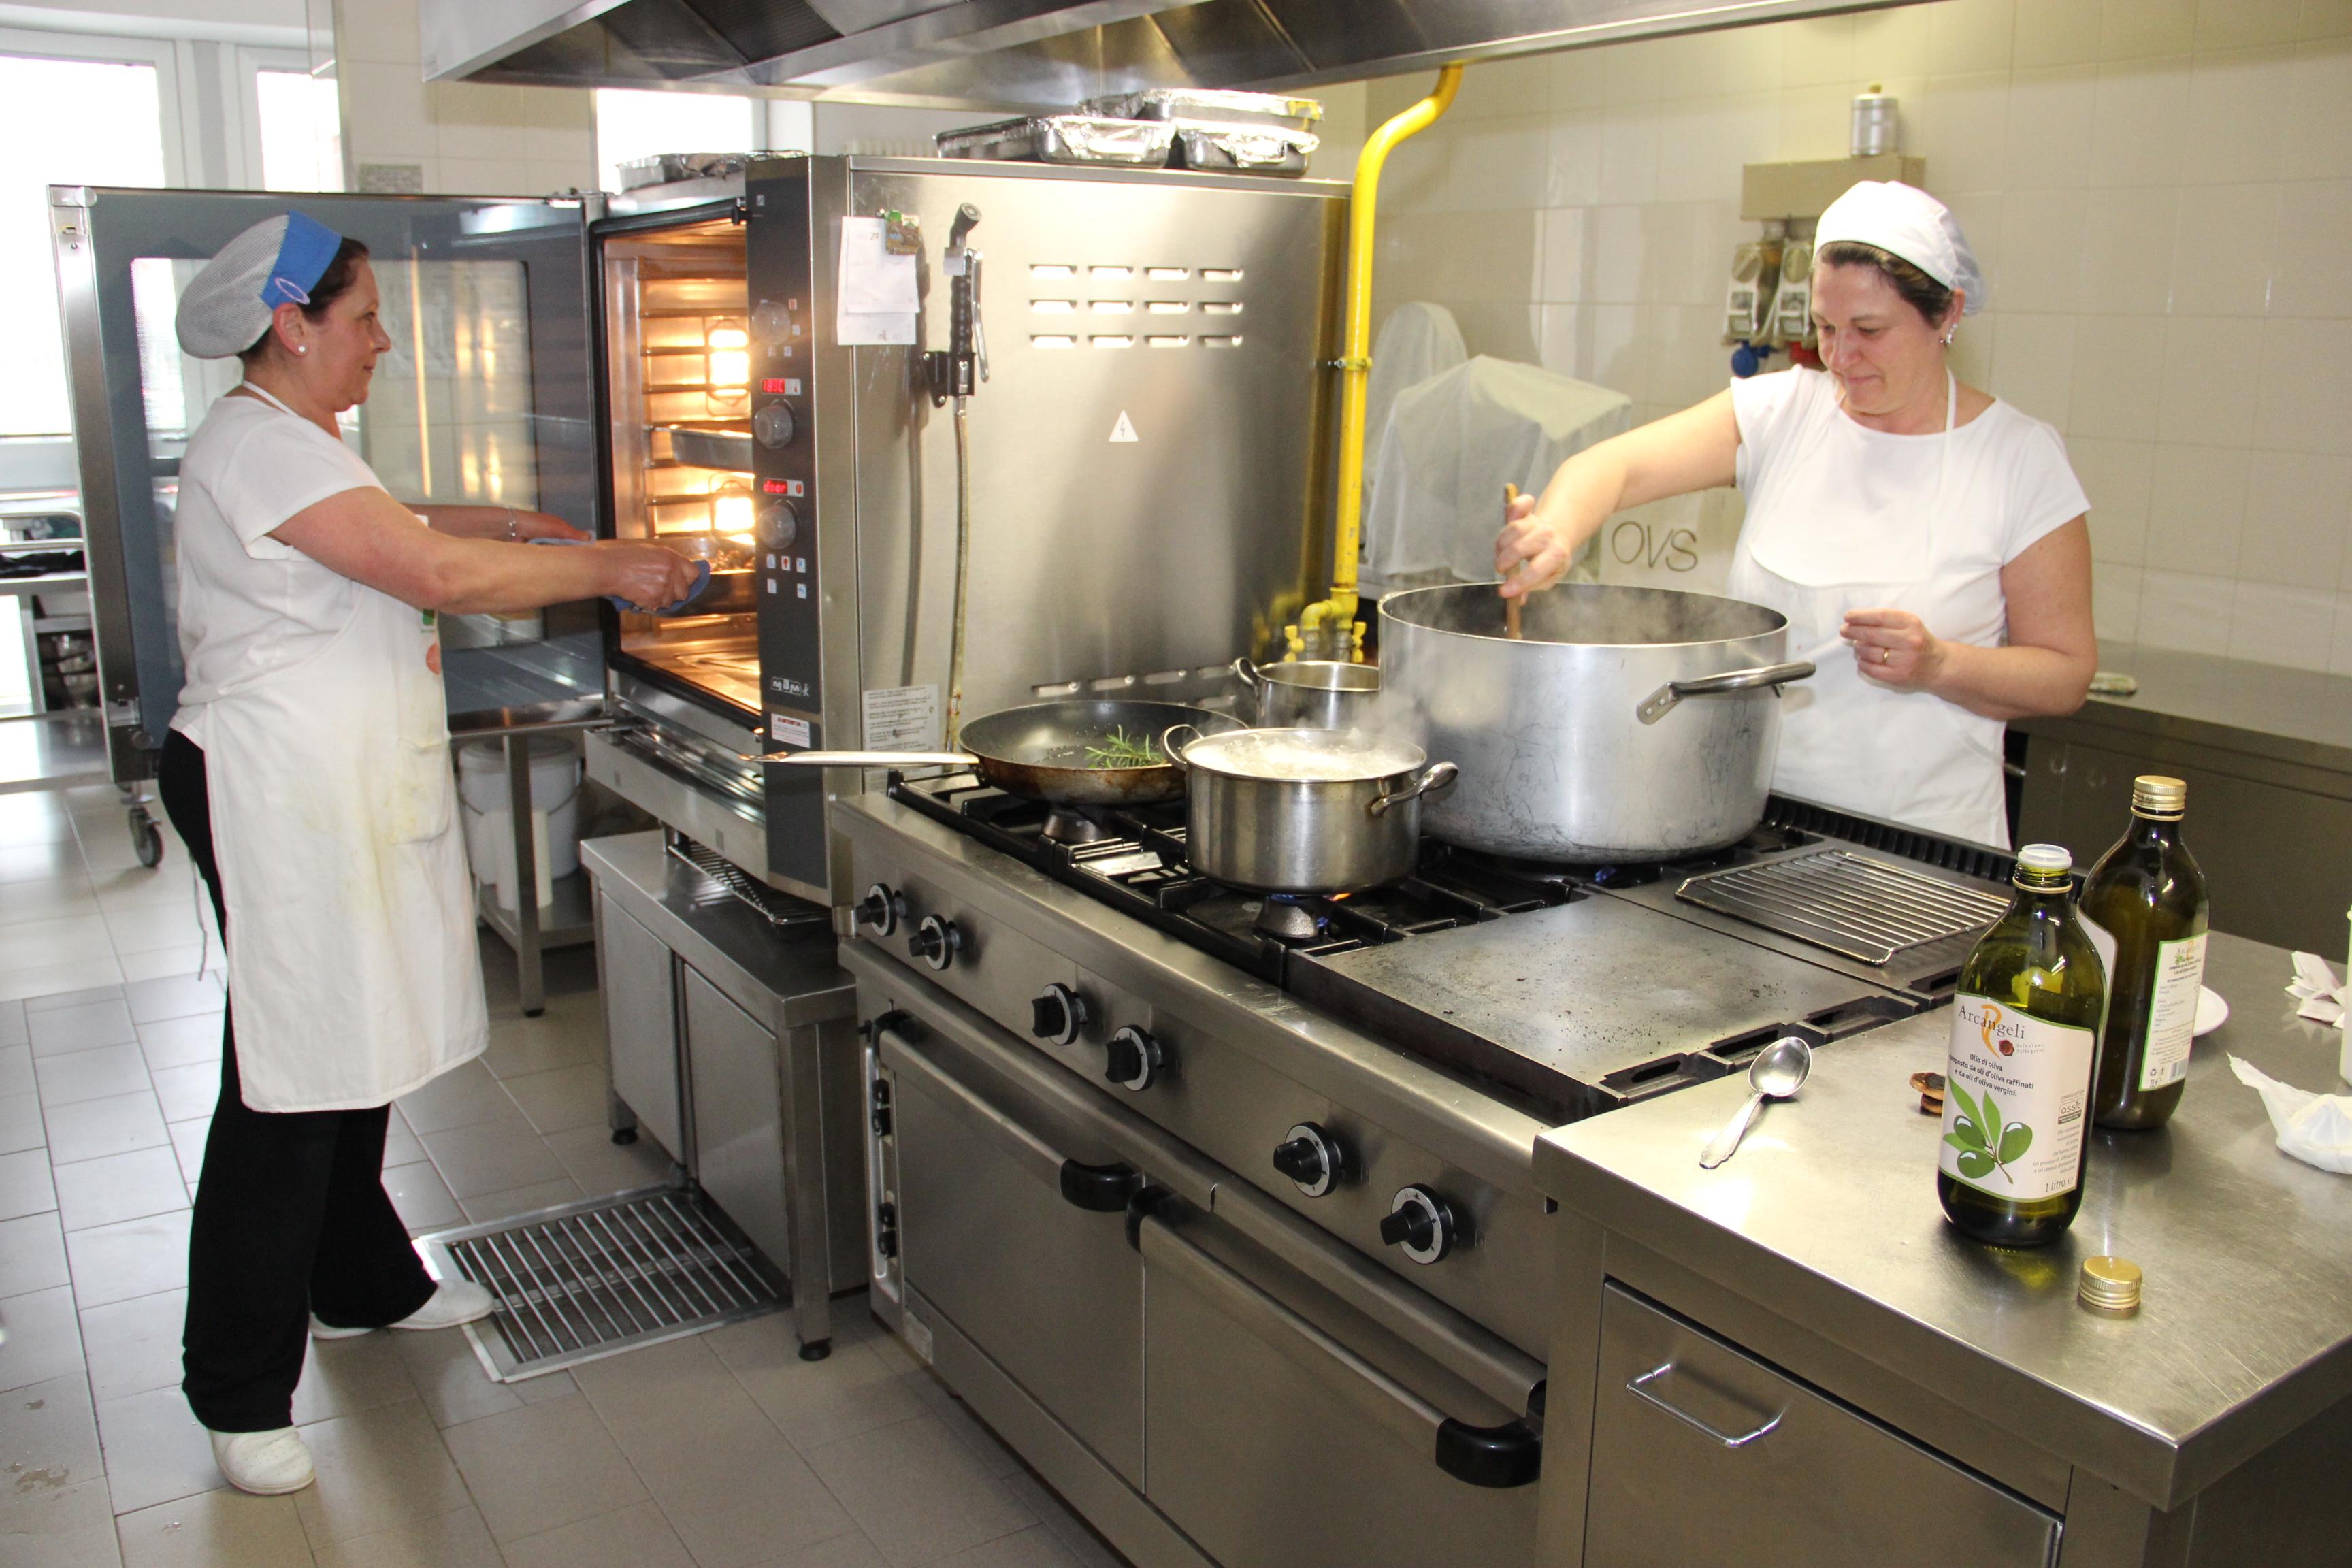 Cucina Scuola Maria Ausiliatrice - Lodi